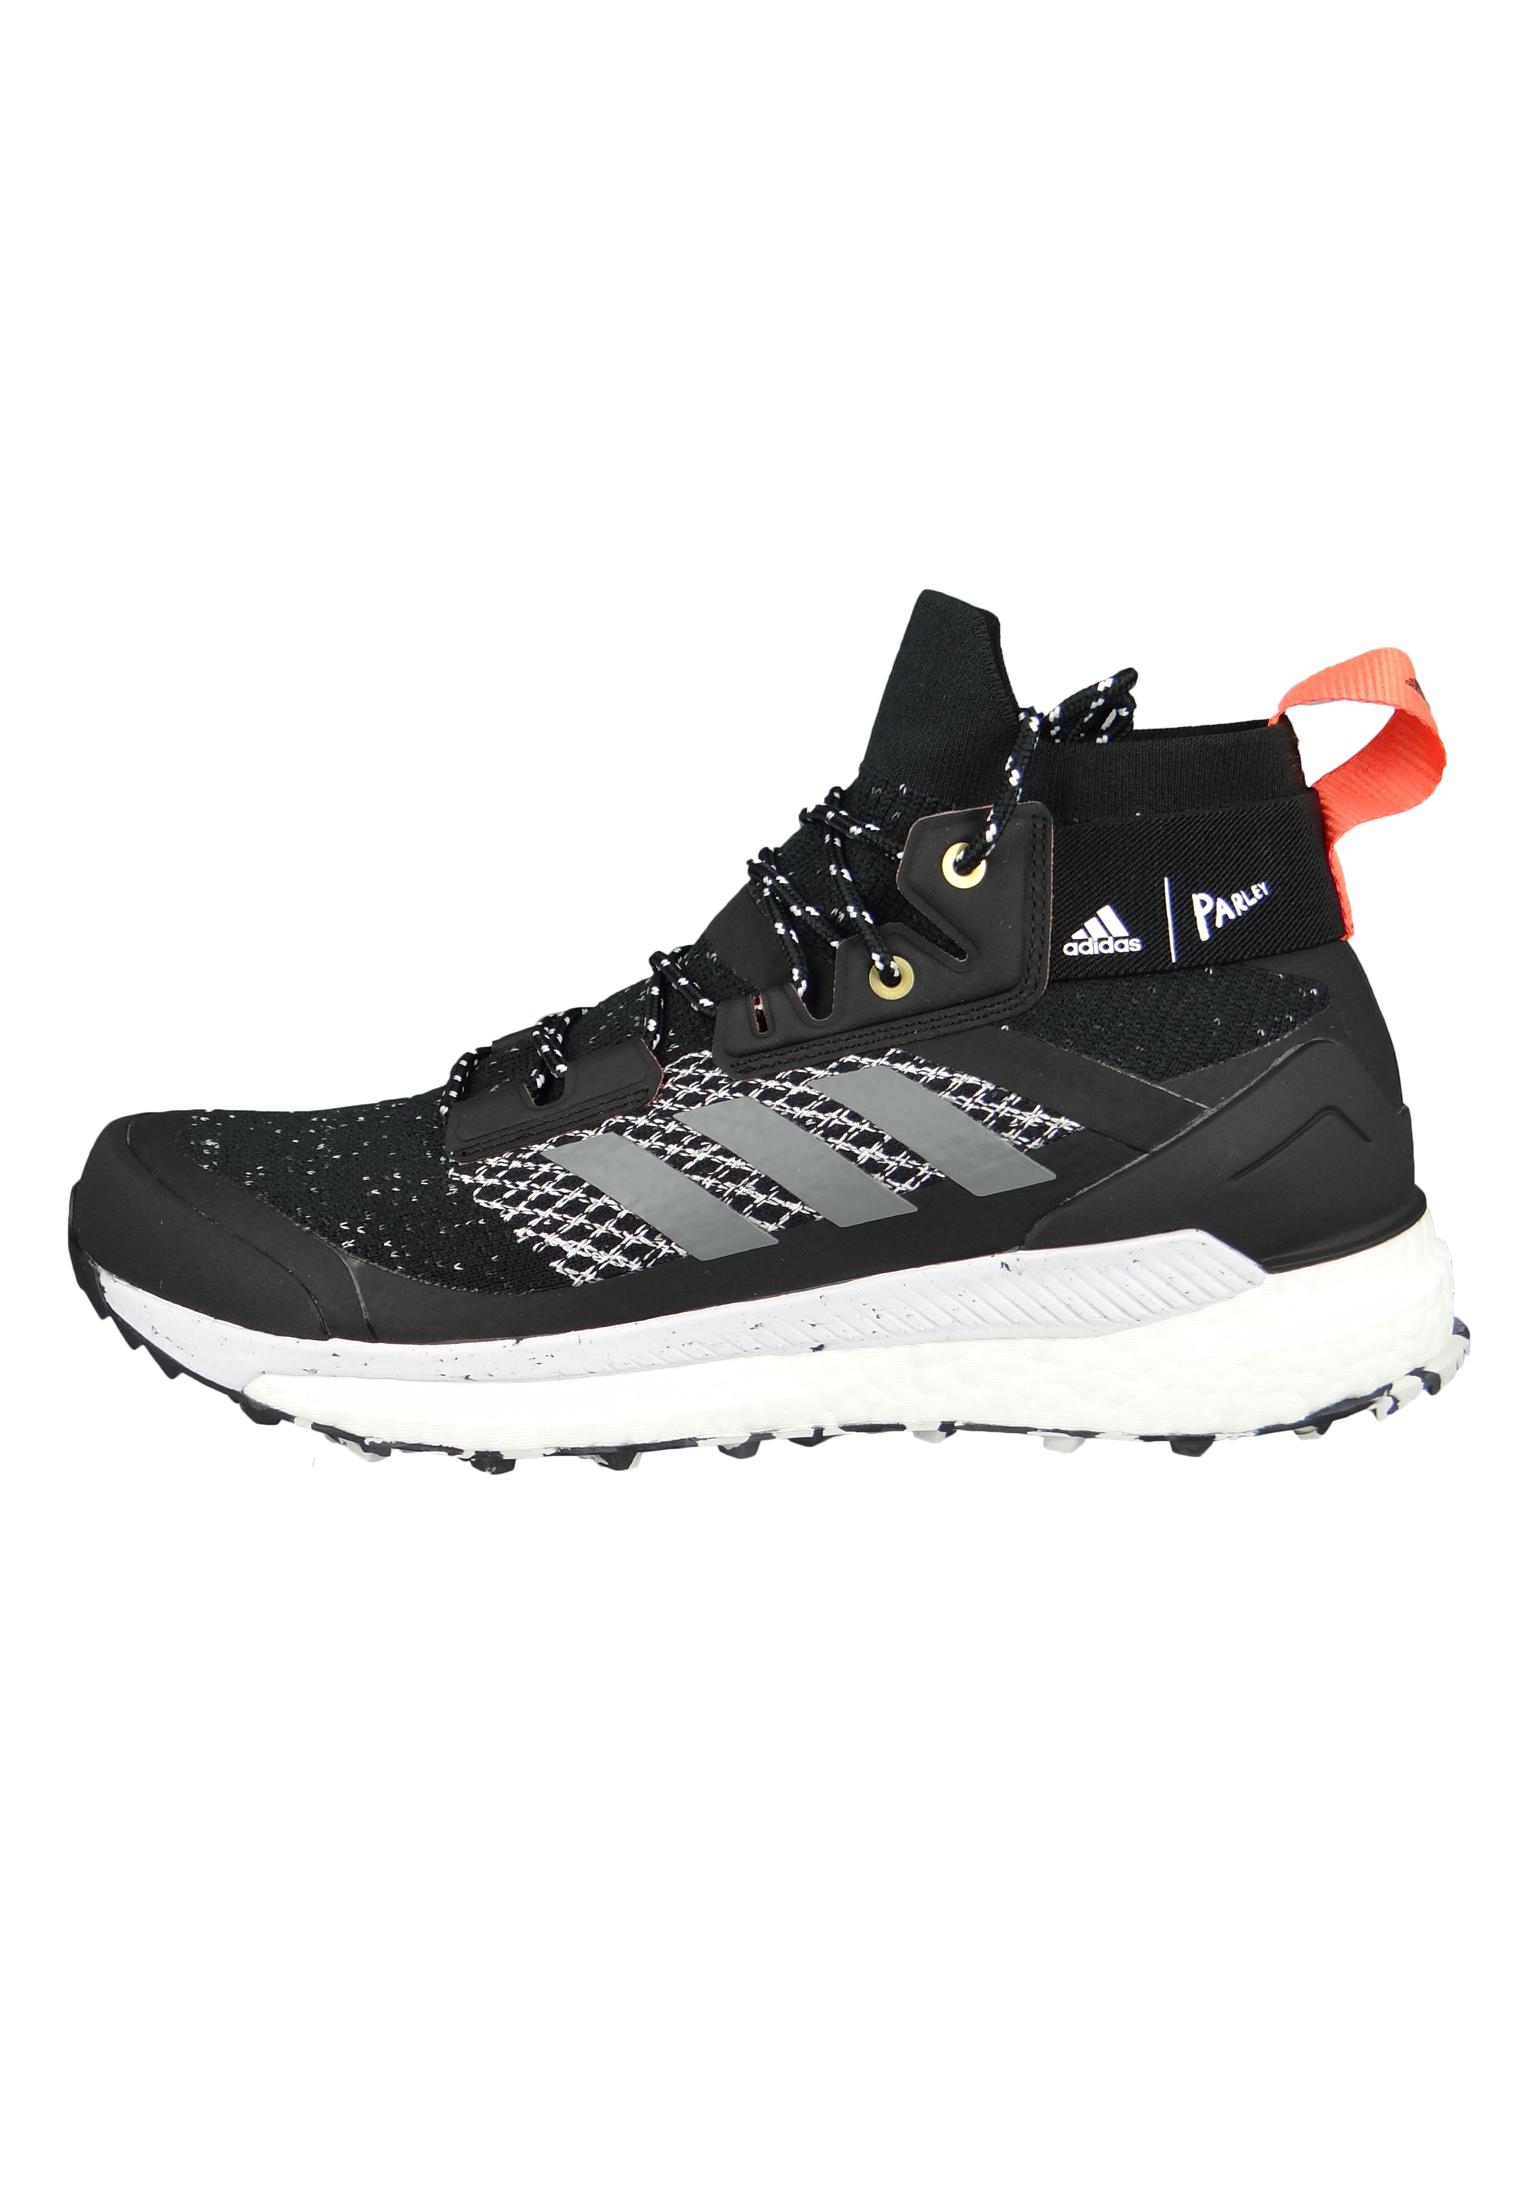 adidas TERREX FREE HIKER EF0347 Herren Hiking Wanderschuhe core black Schwarz